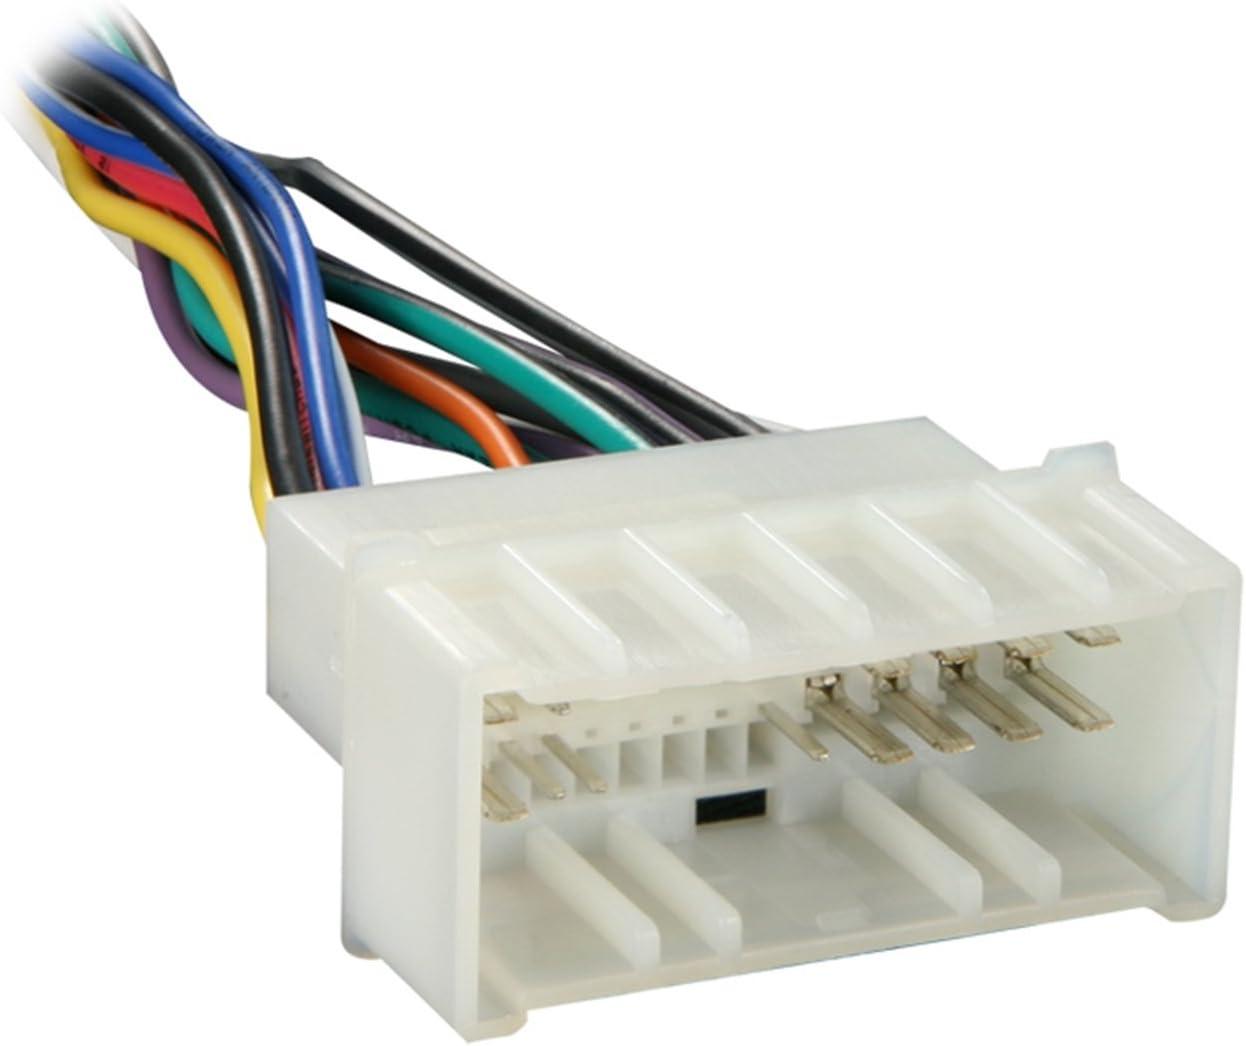 Amazon.com: Metra 70-1004 Radio Wiring Harness for 04-Up Kia/06-Up Hyndai:  Car ElectronicsAmazon.com